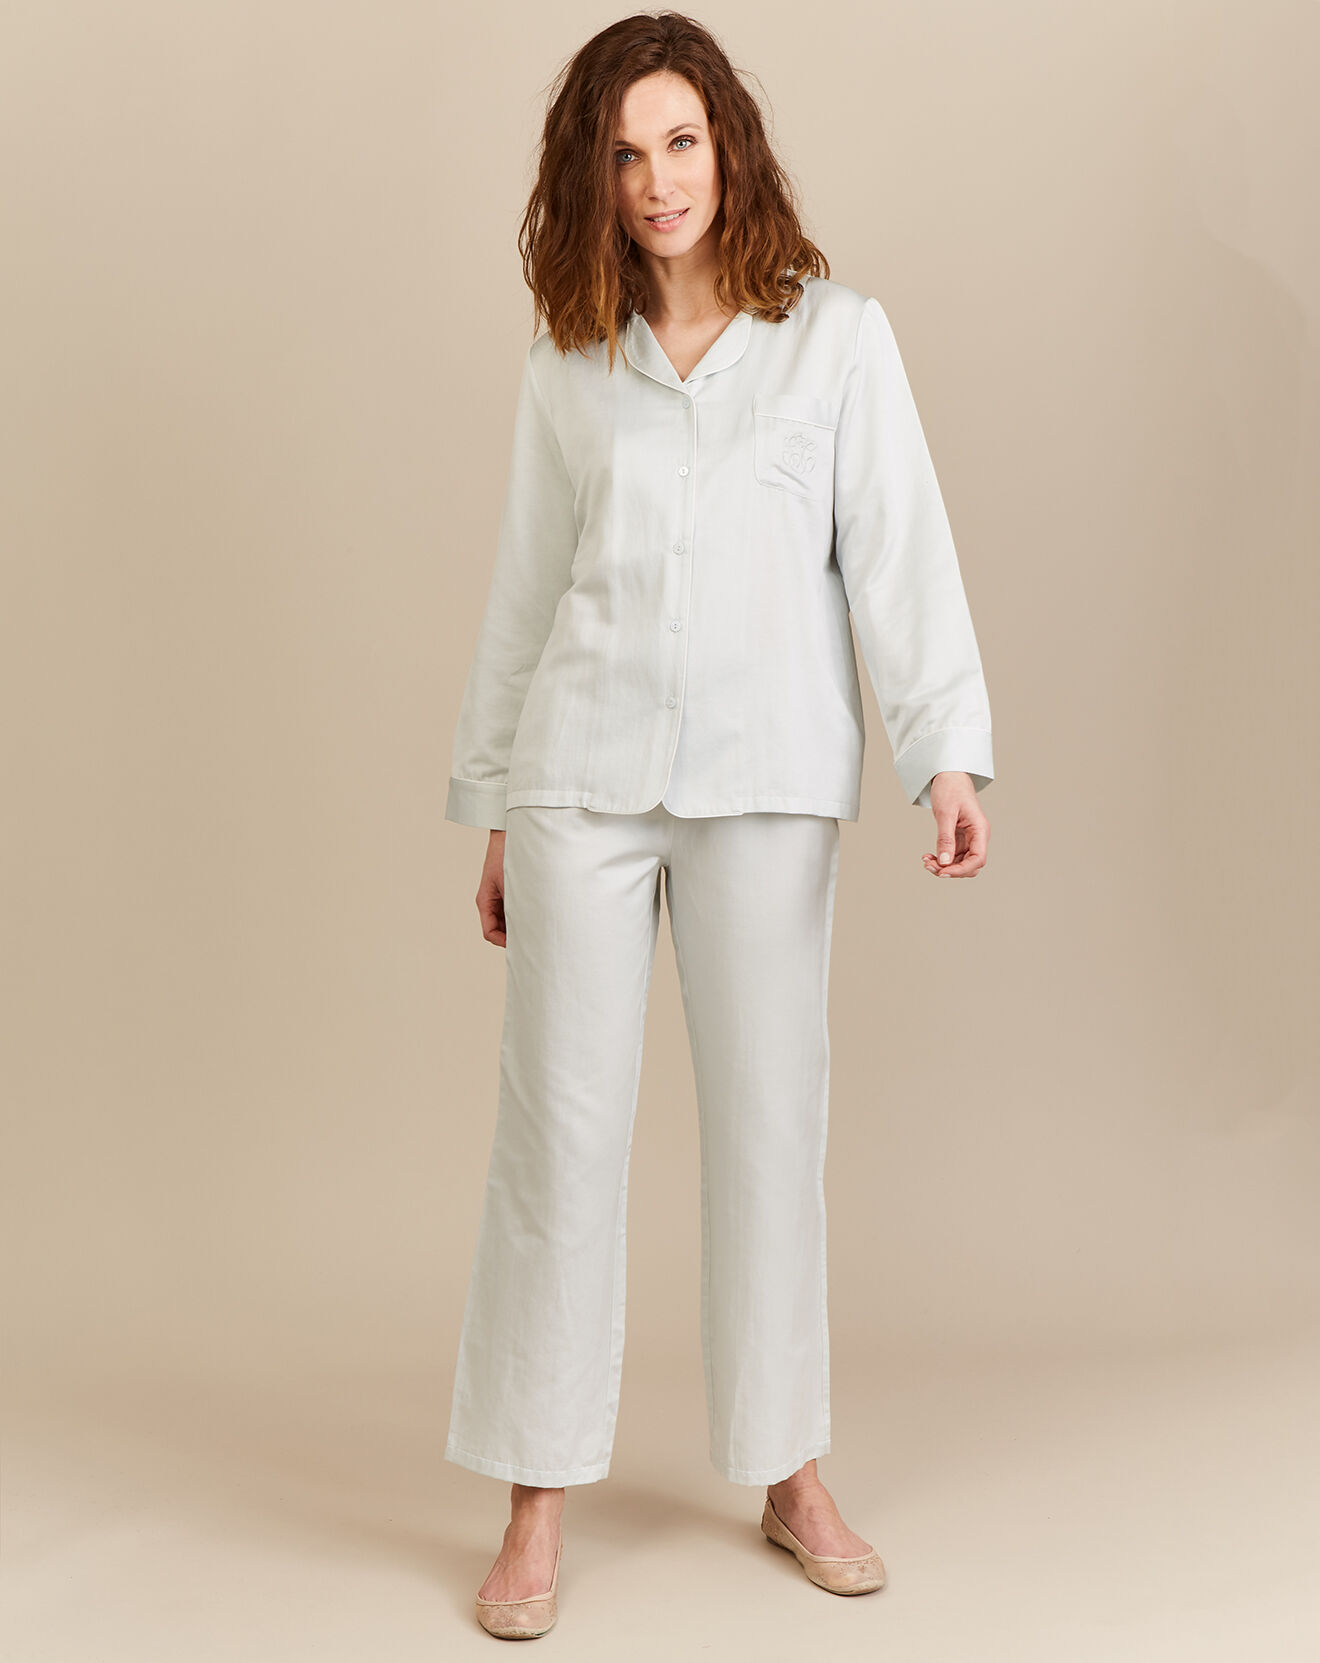 Pyjama reflet de Satin Coton/Polyester jade